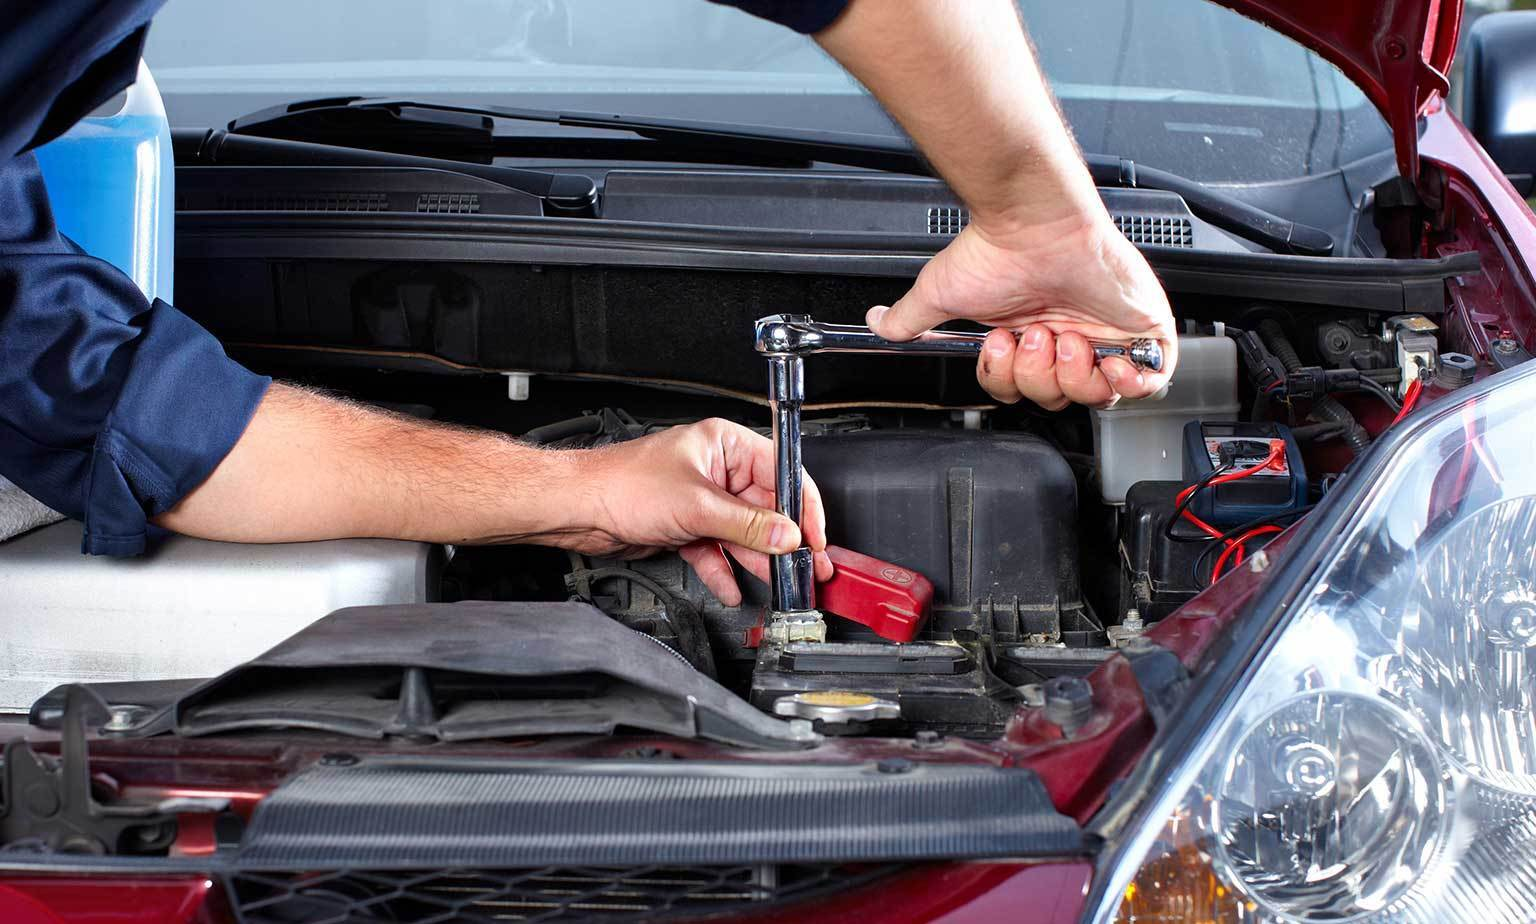 Shop Automotive Tools & Supplies